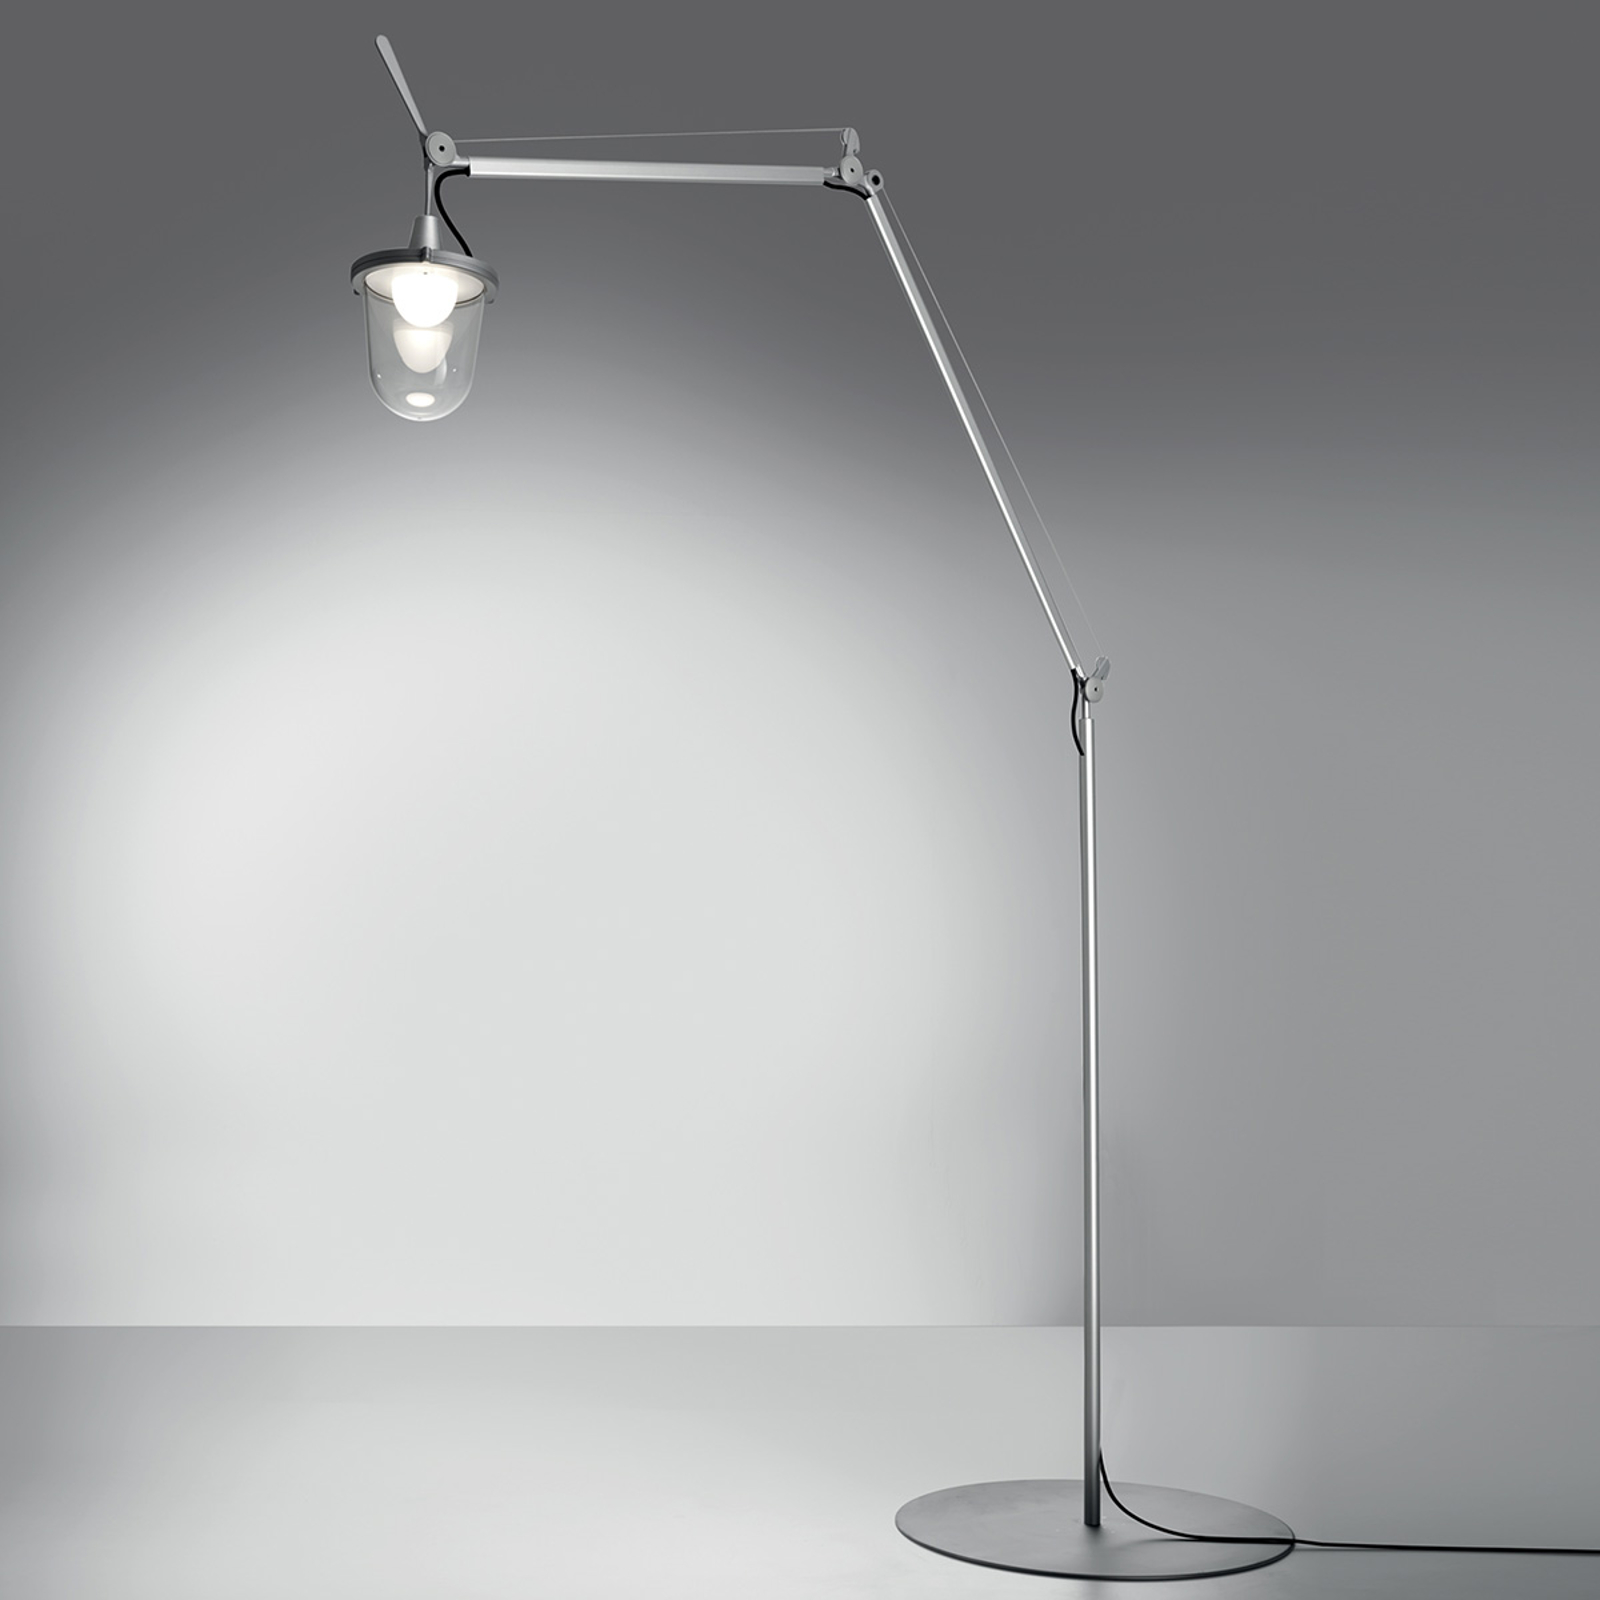 Artemide Tolomeo lantaarn terraslamp